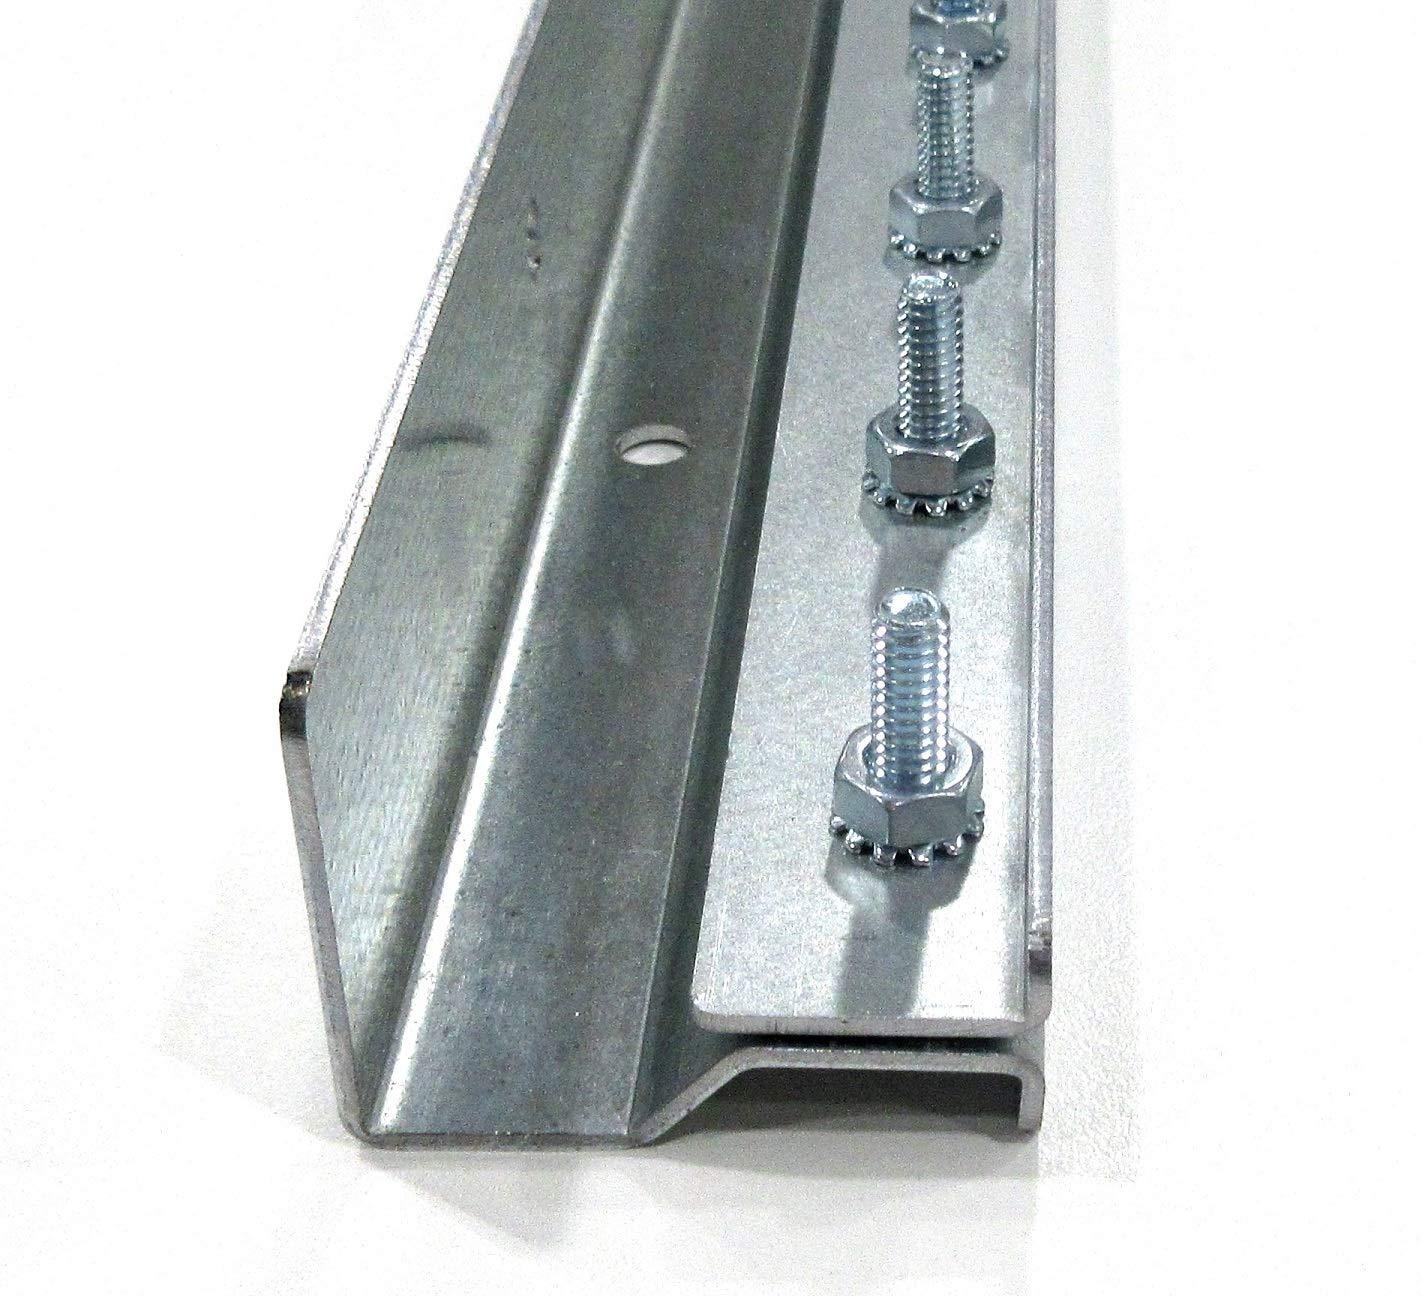 Strip Curtain Hardware 3 Foot Section Universal Mount Hanger